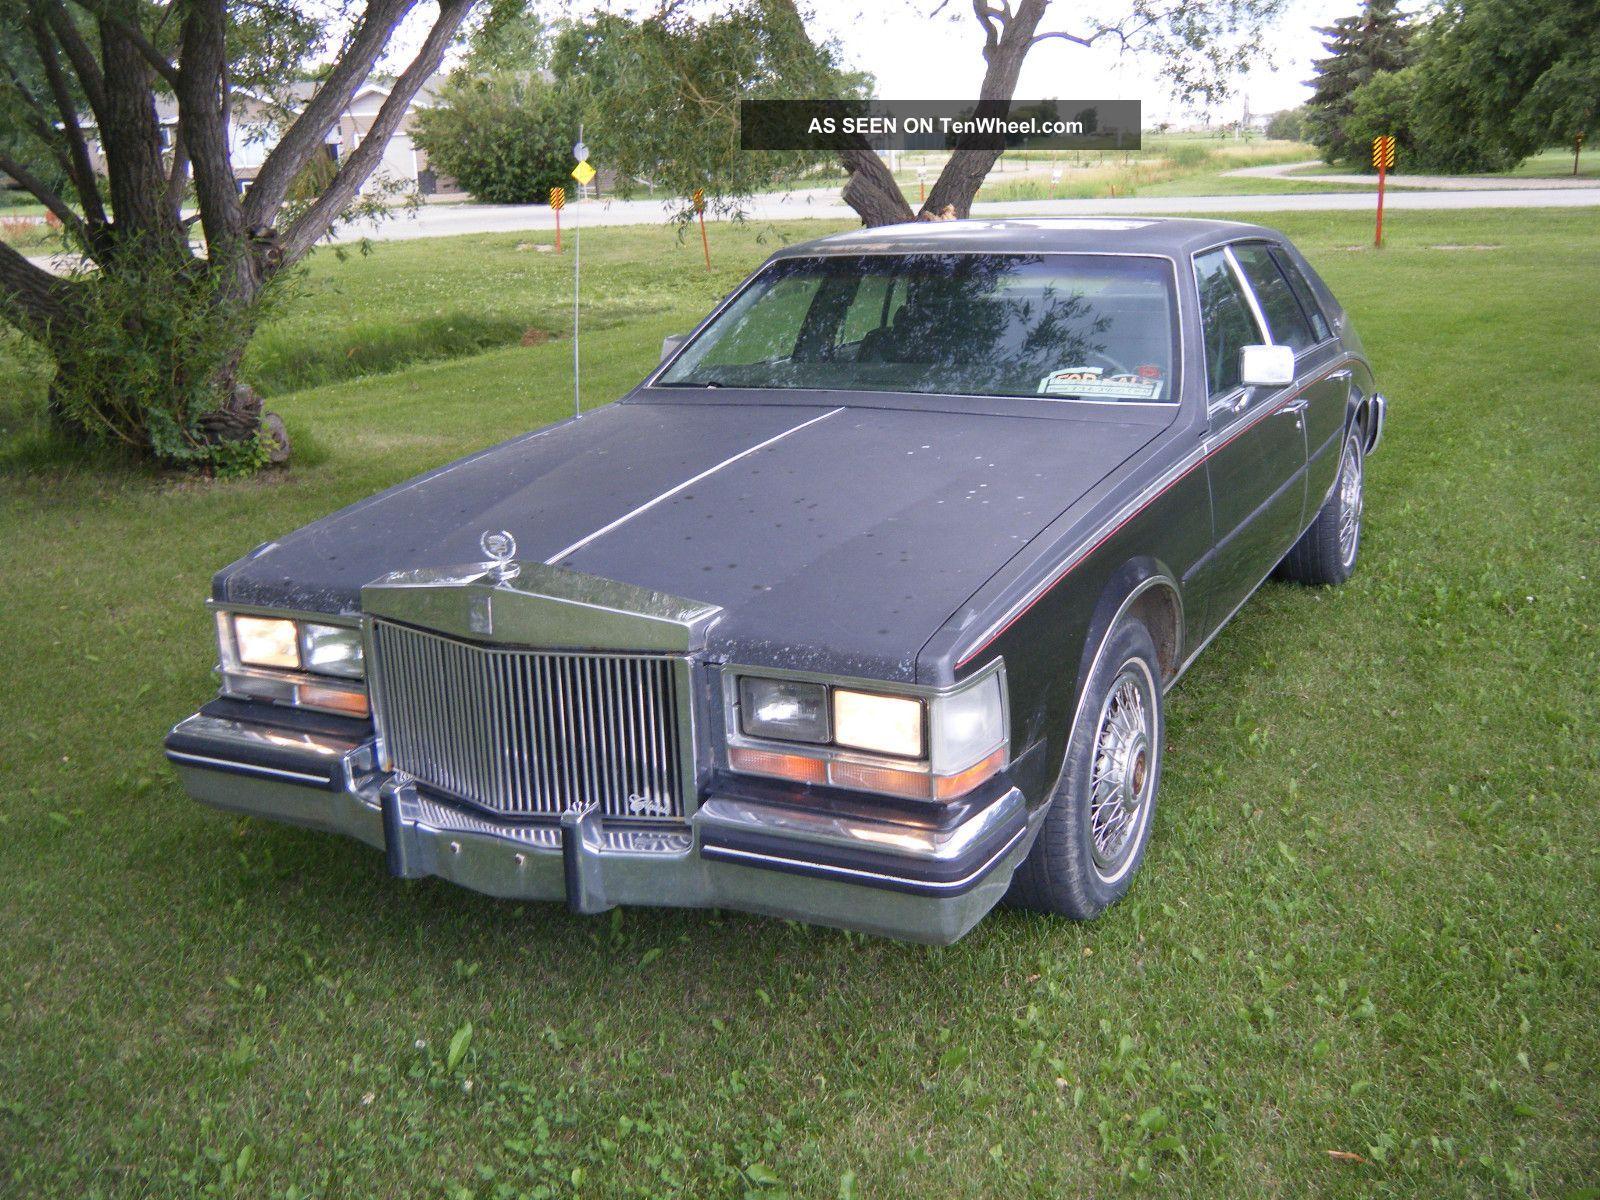 1985 cadillac seville elegante sedan 4 door 4 1l. Cars Review. Best American Auto & Cars Review